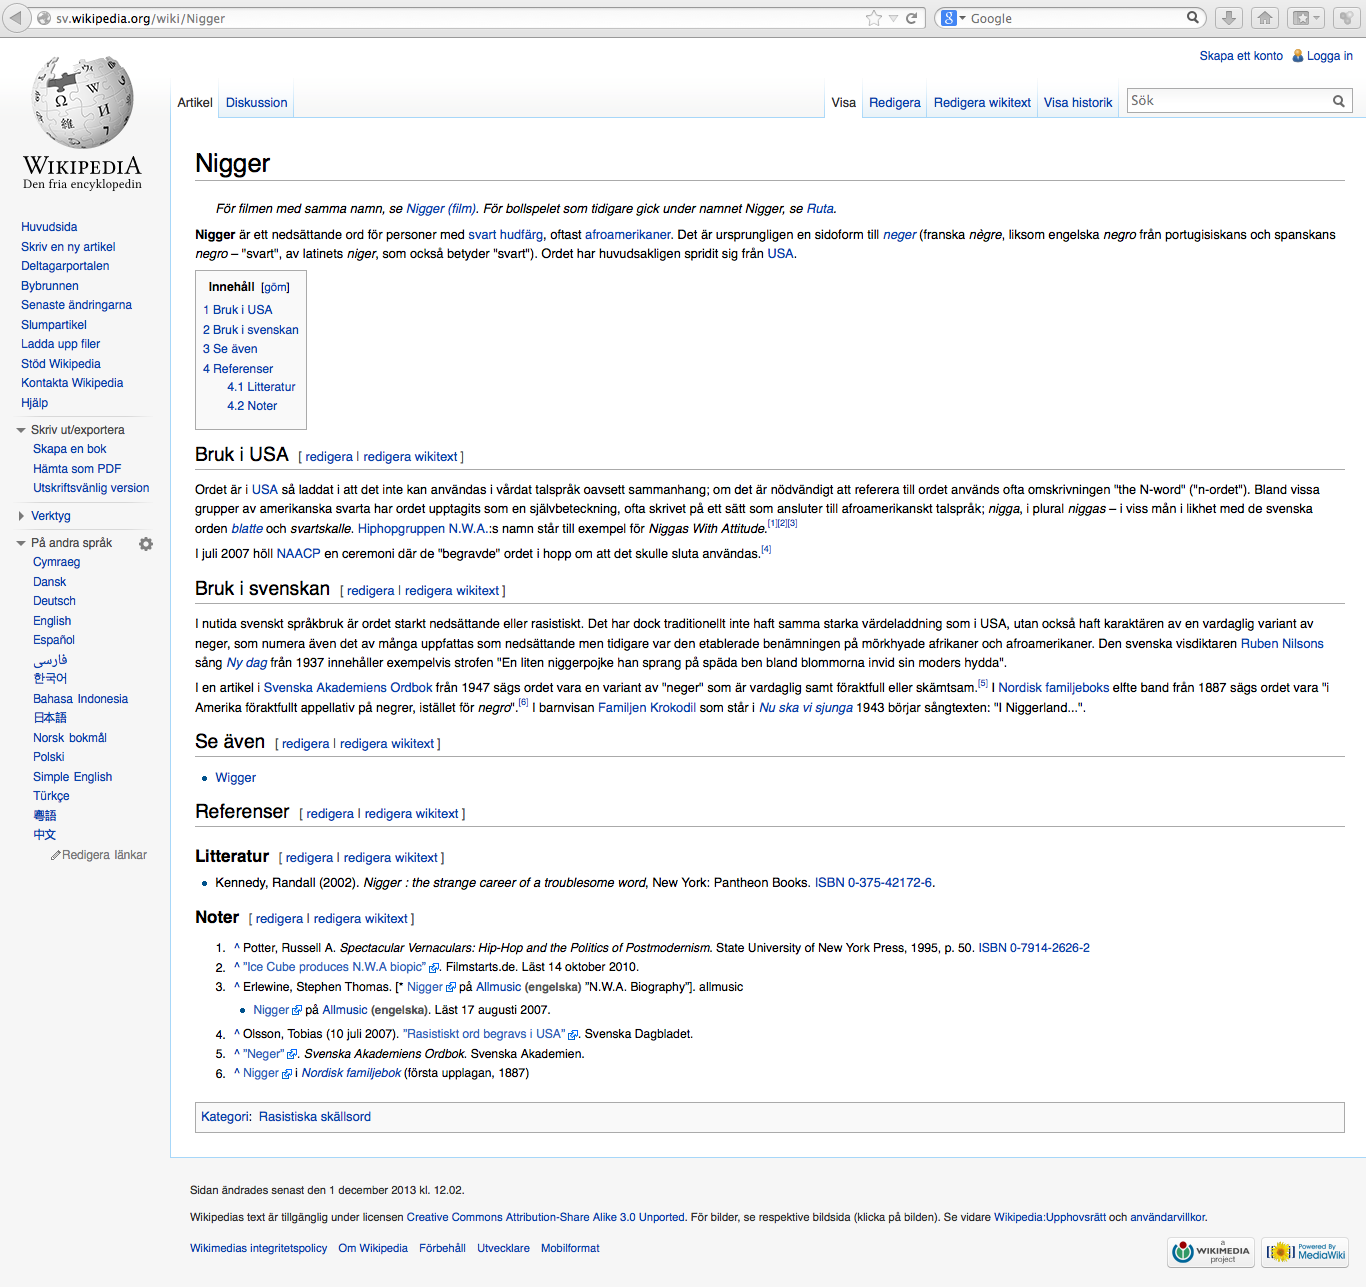 Wikipedia art. 'Nigger'